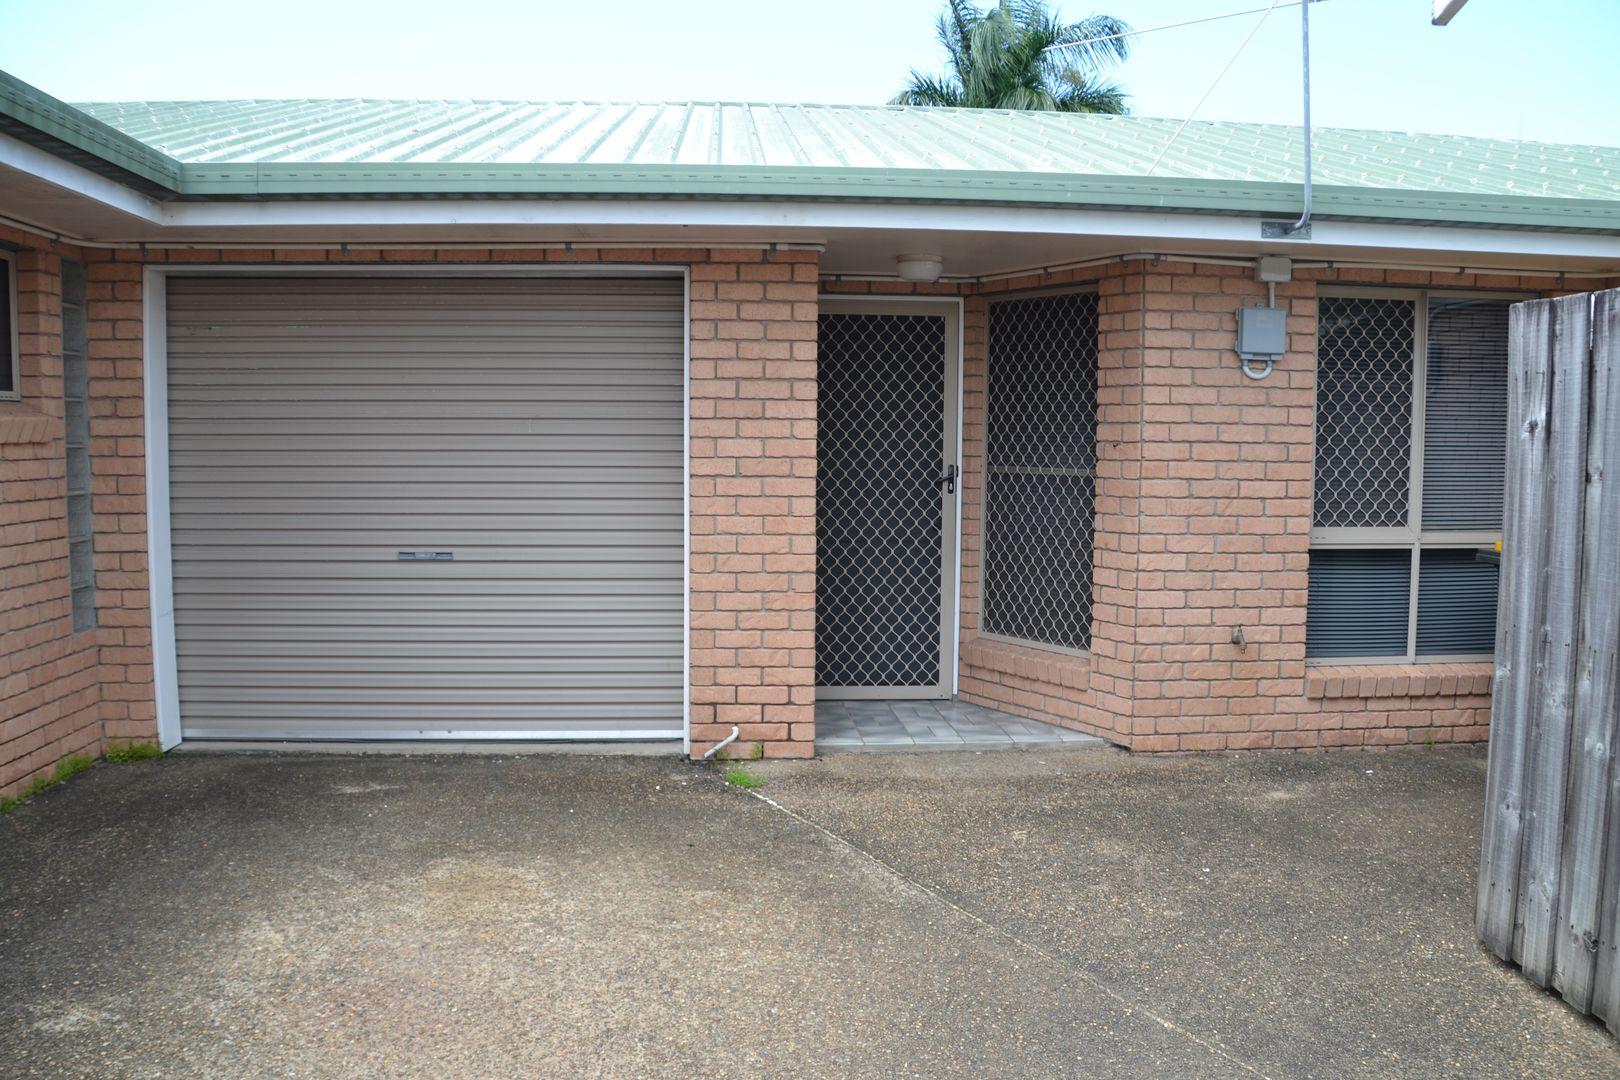 2/21 Kate Street, East MacKay QLD 4740, Image 0